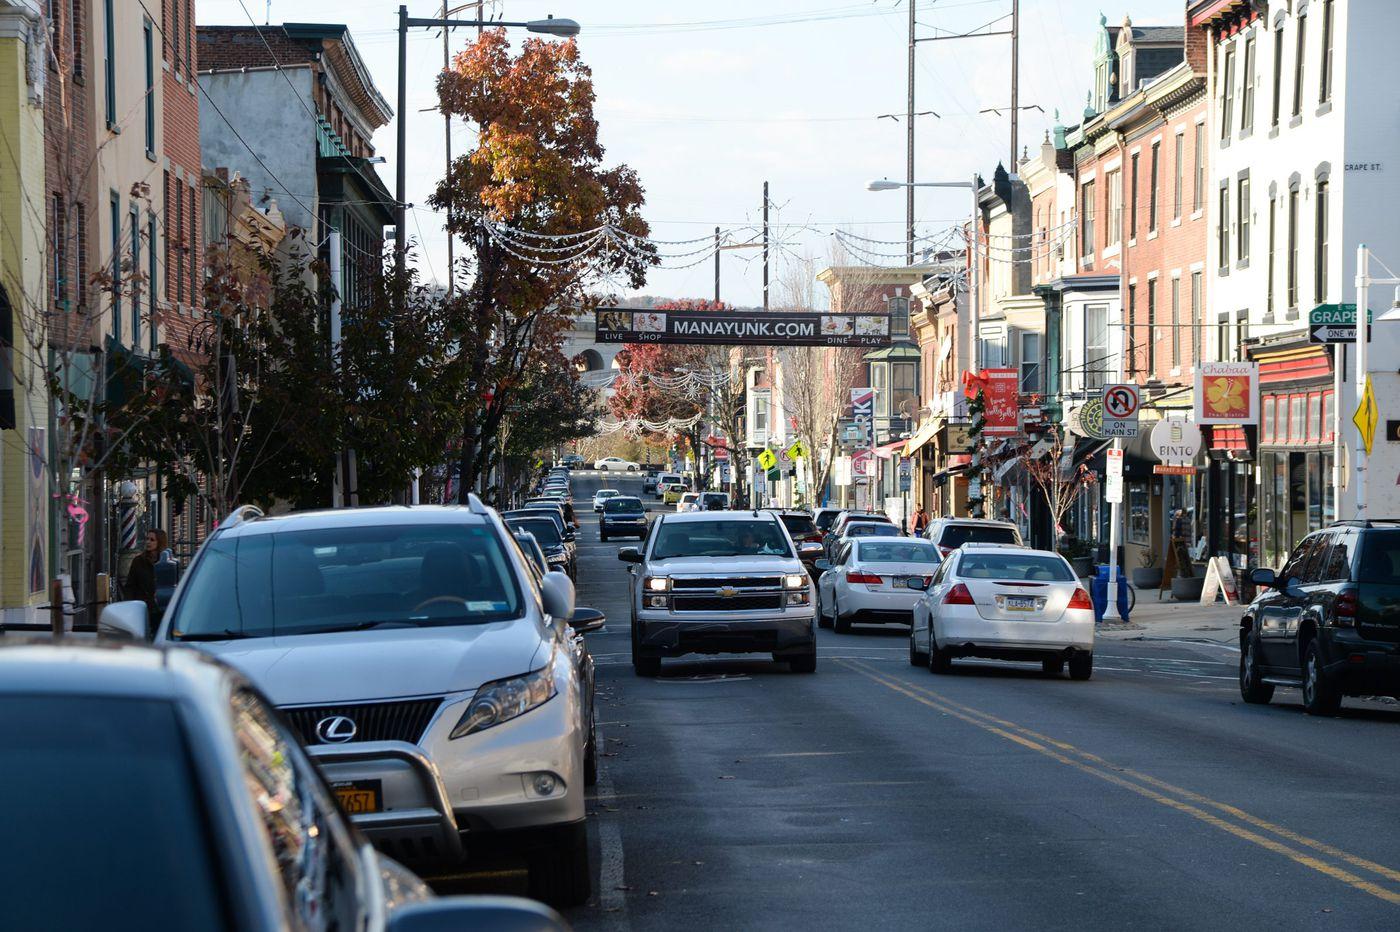 Where are millennials flocking in Philadelphia?